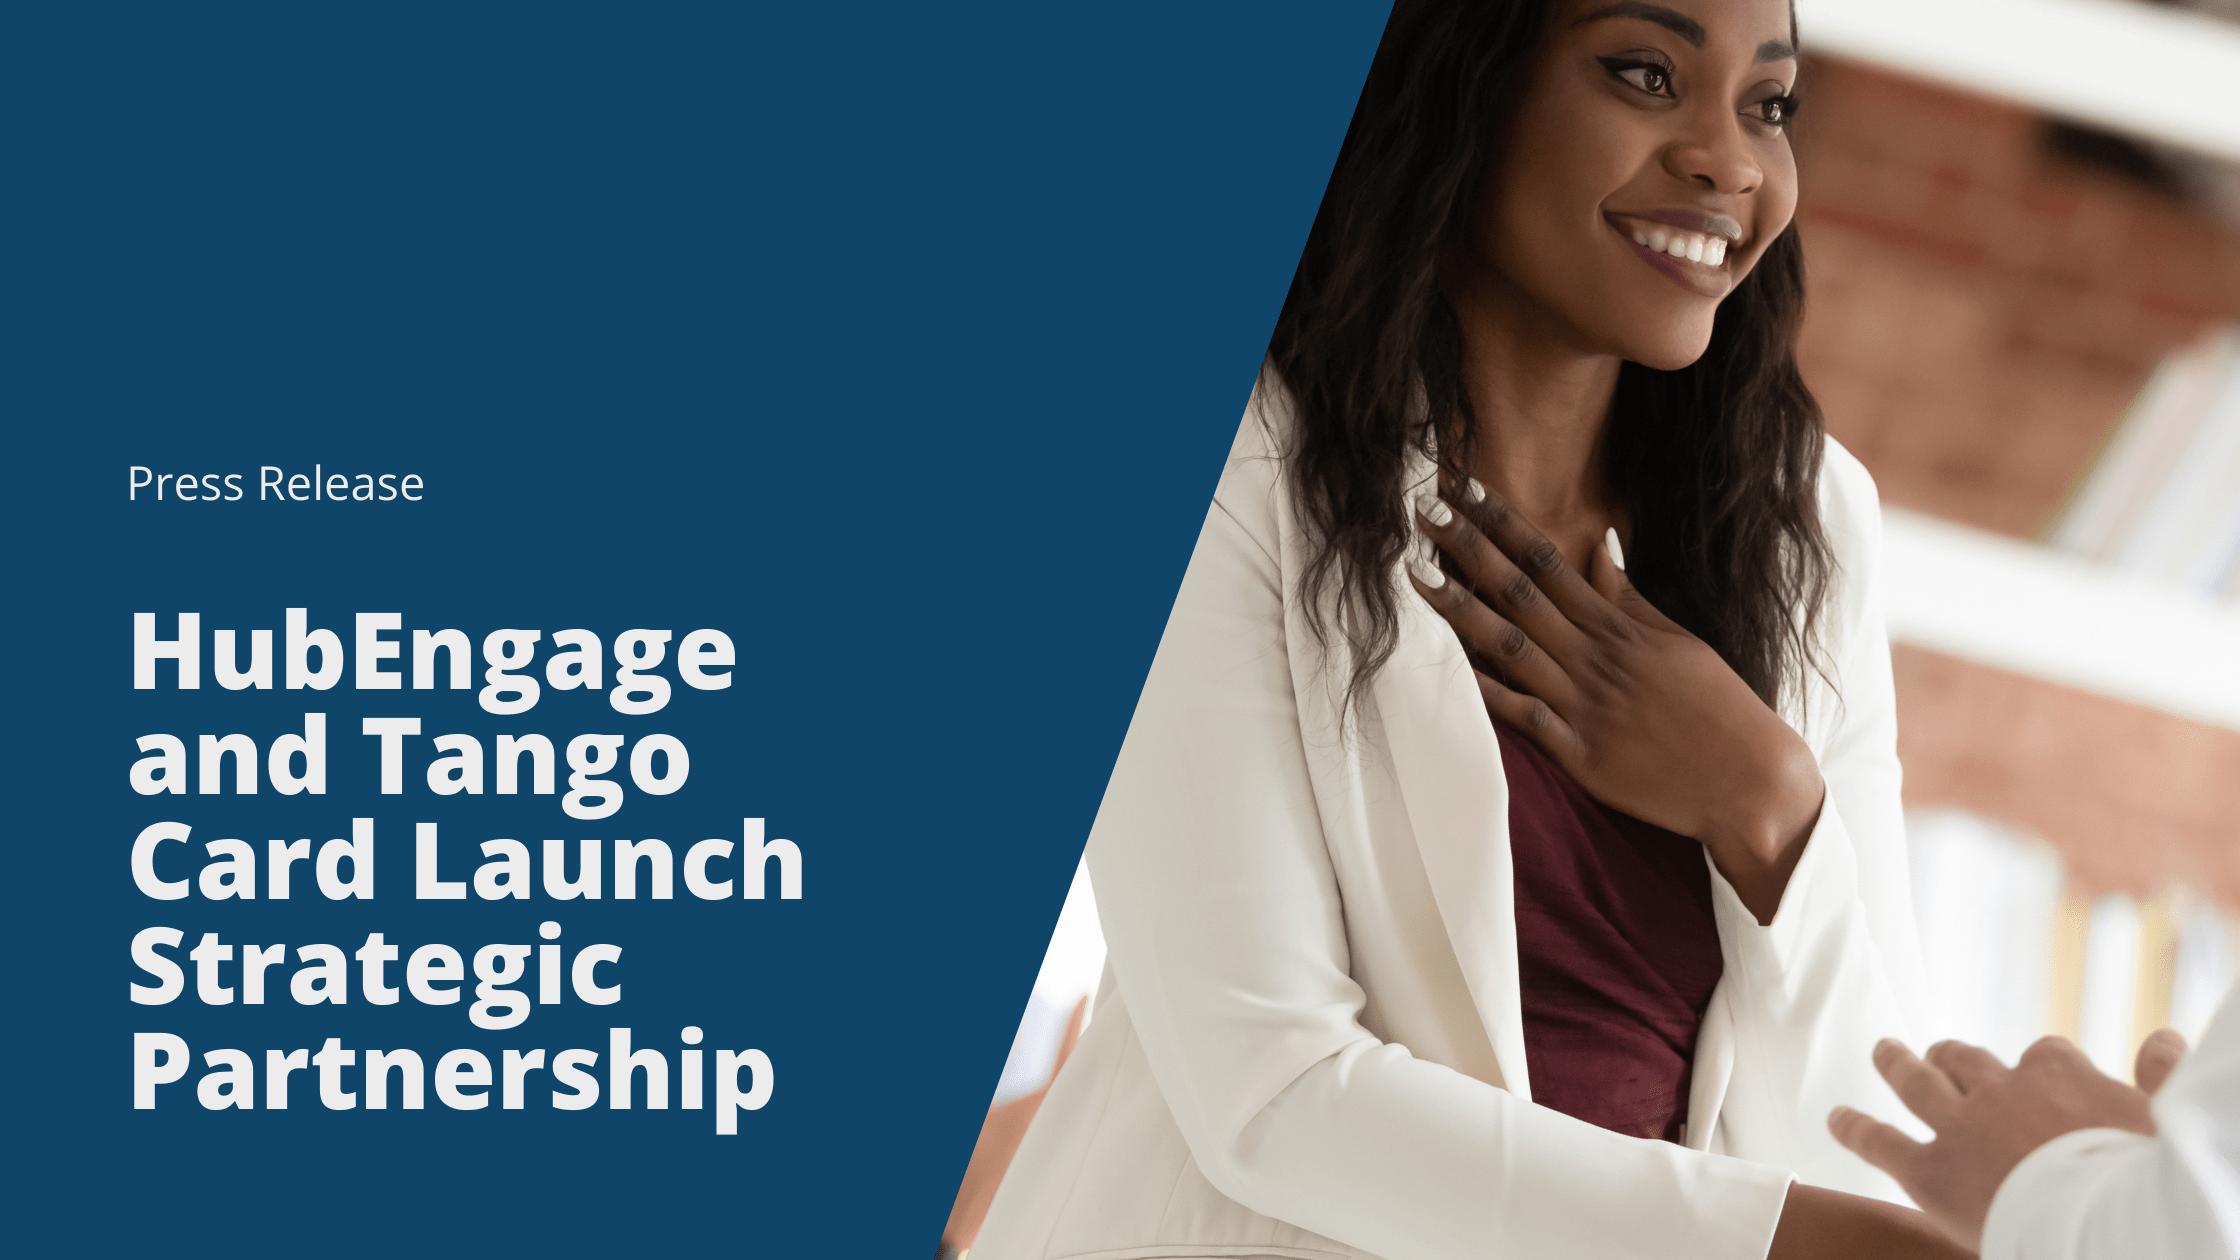 HubEngage Employee Rewards